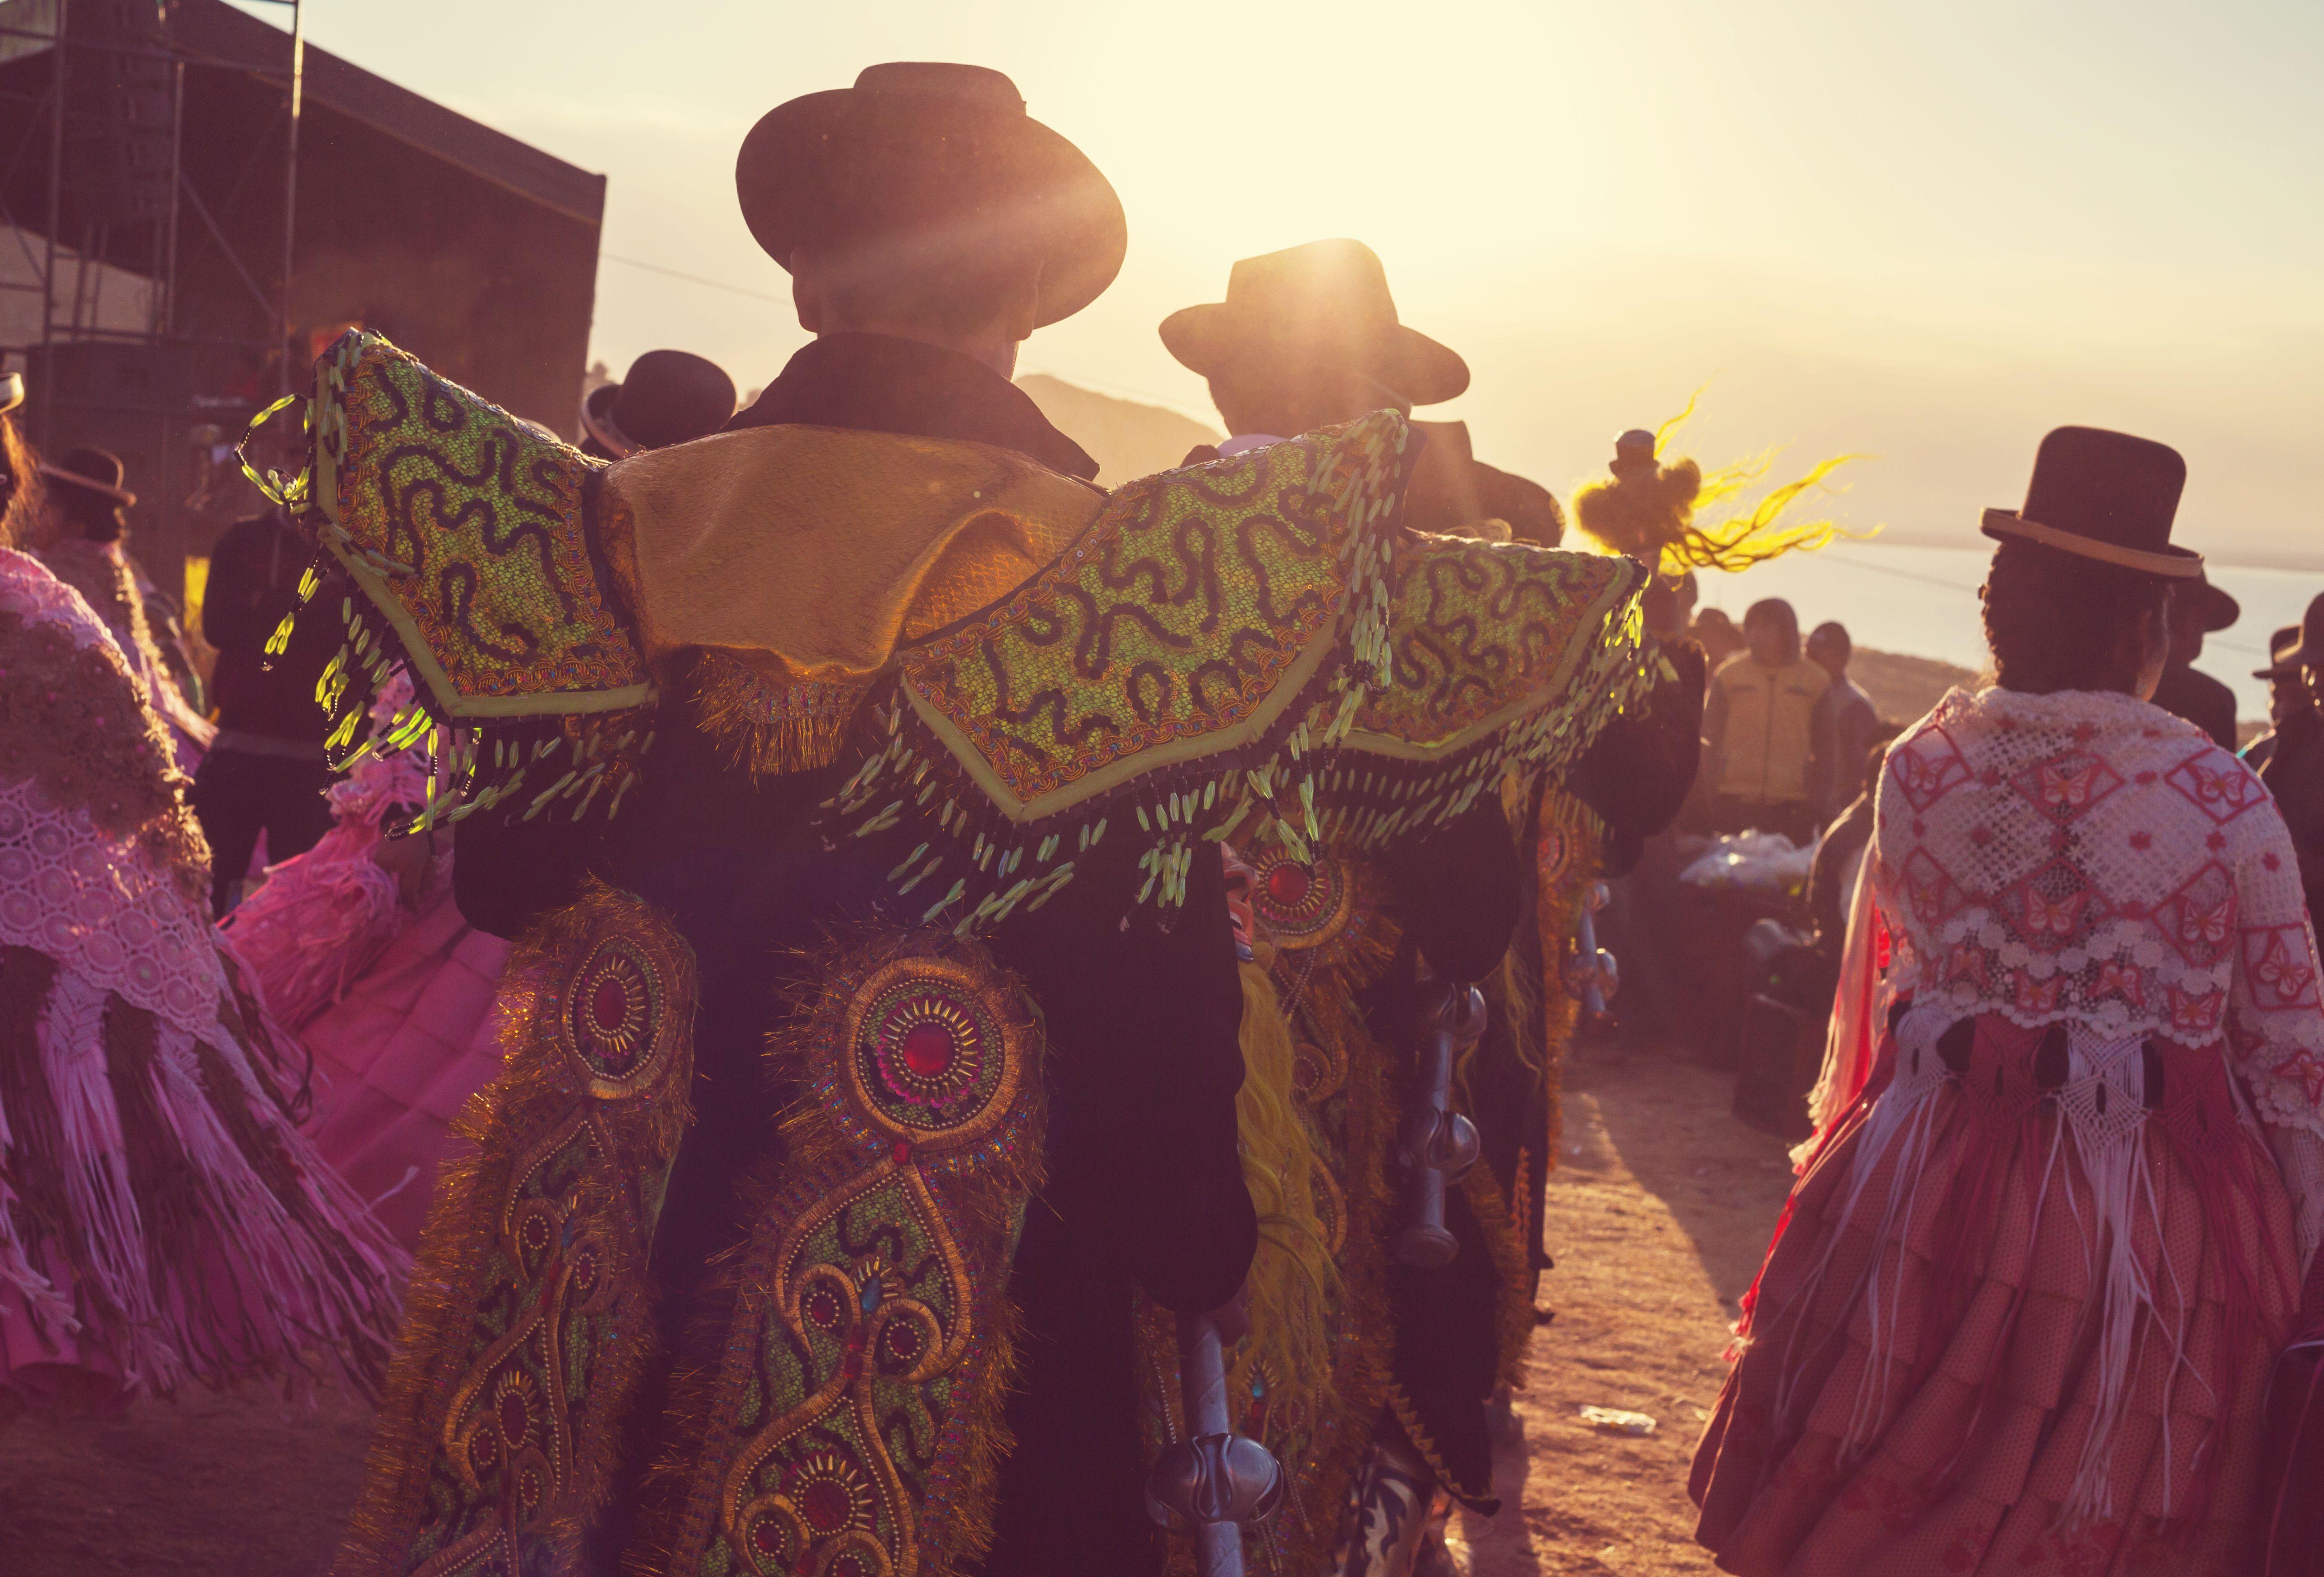 Danzas de Puno in 2020 | Peru, Dance, Music